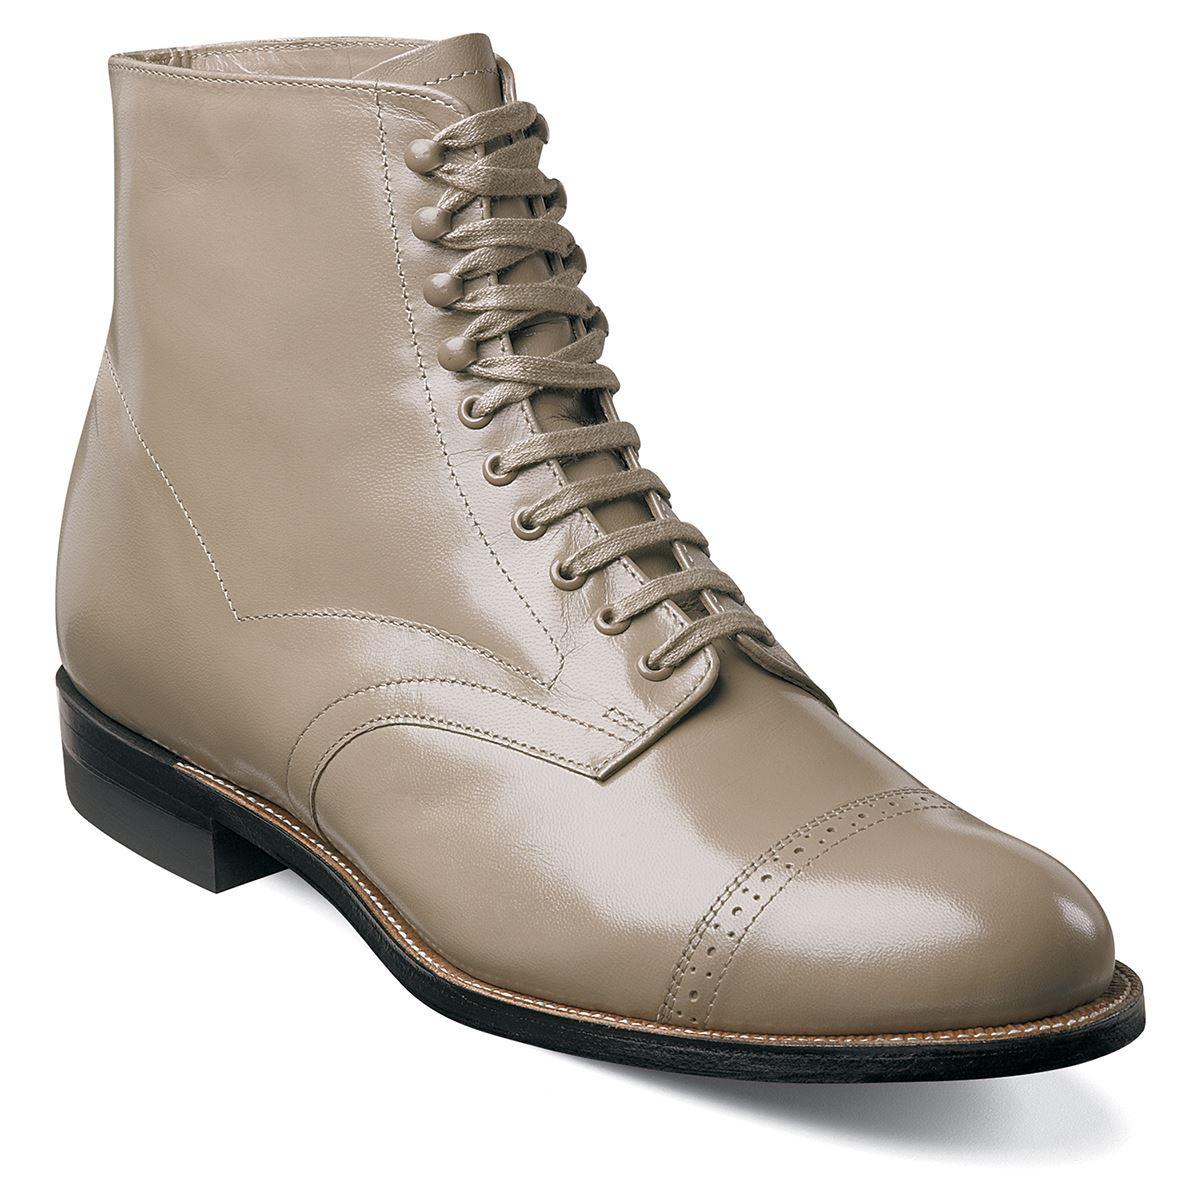 Stacy Adams Mens Madison Cap Toe Boots 00015